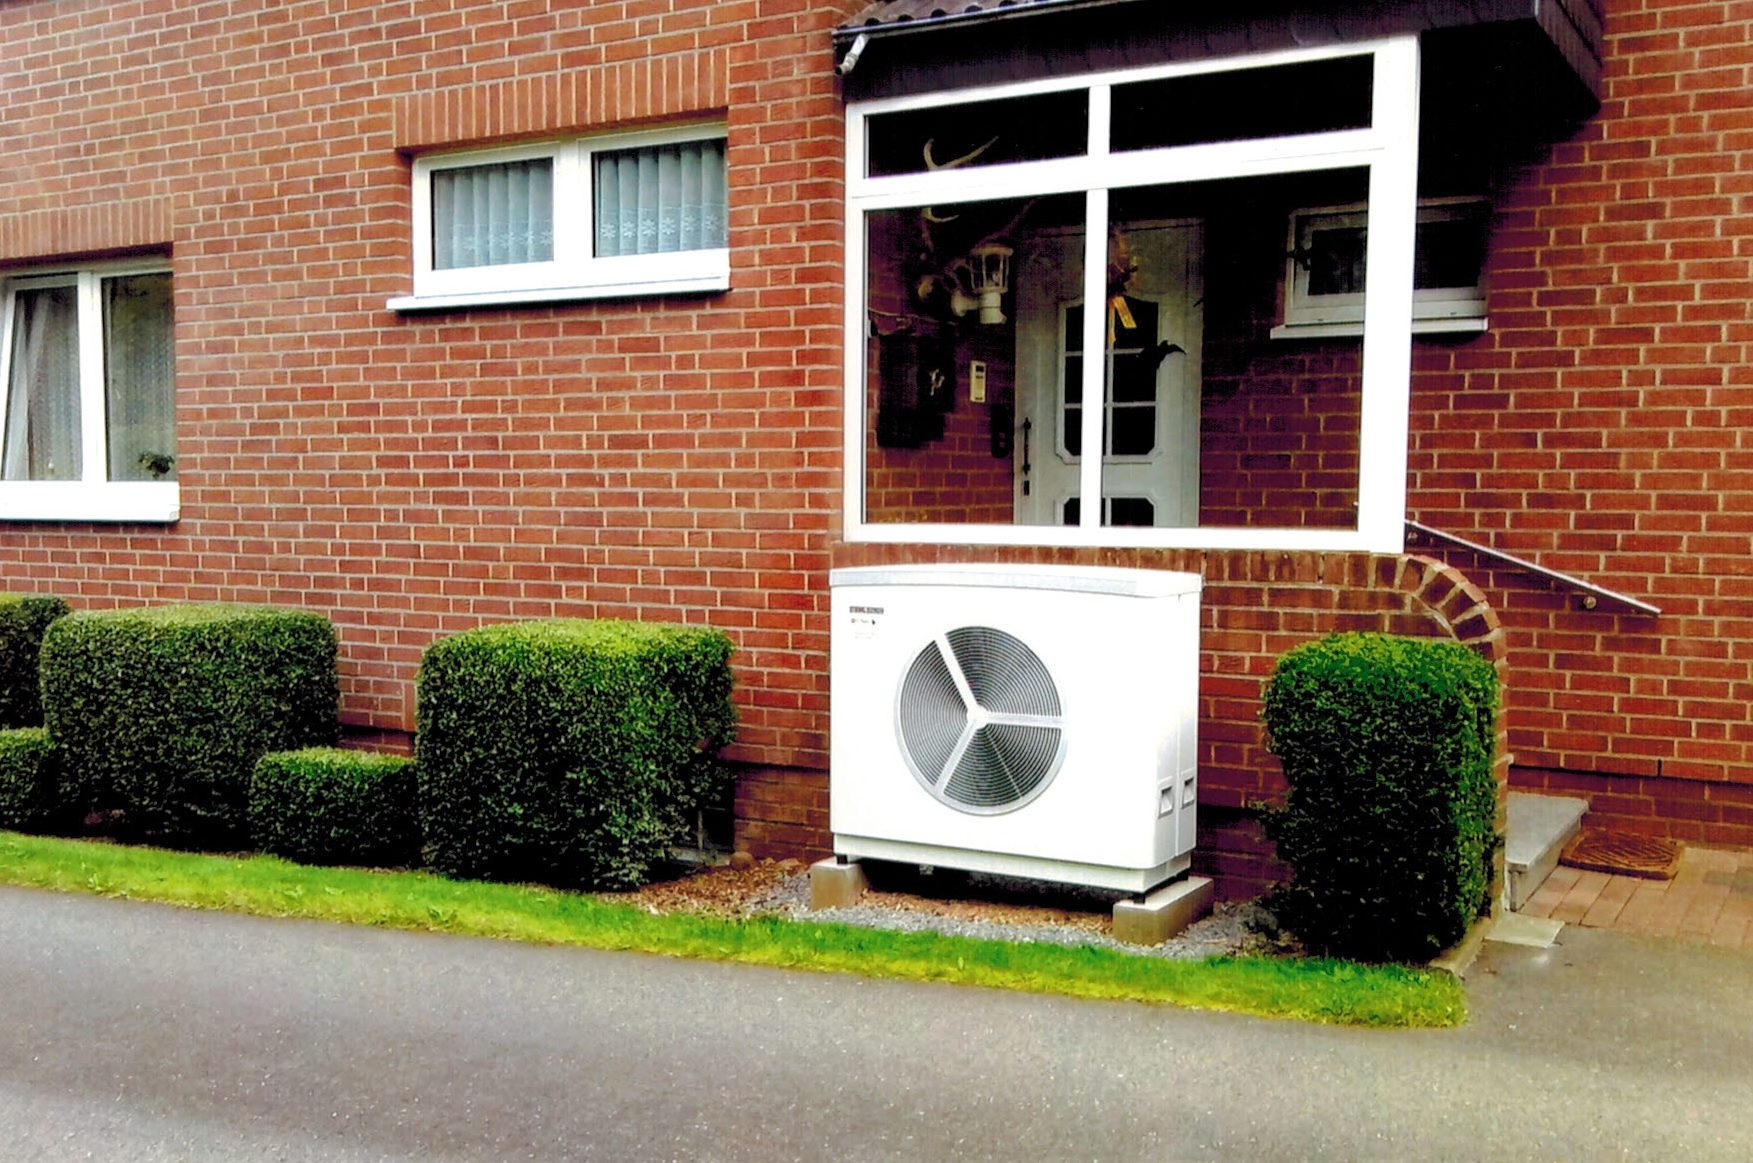 Luft-Wasser-Wärmepumpe Büro